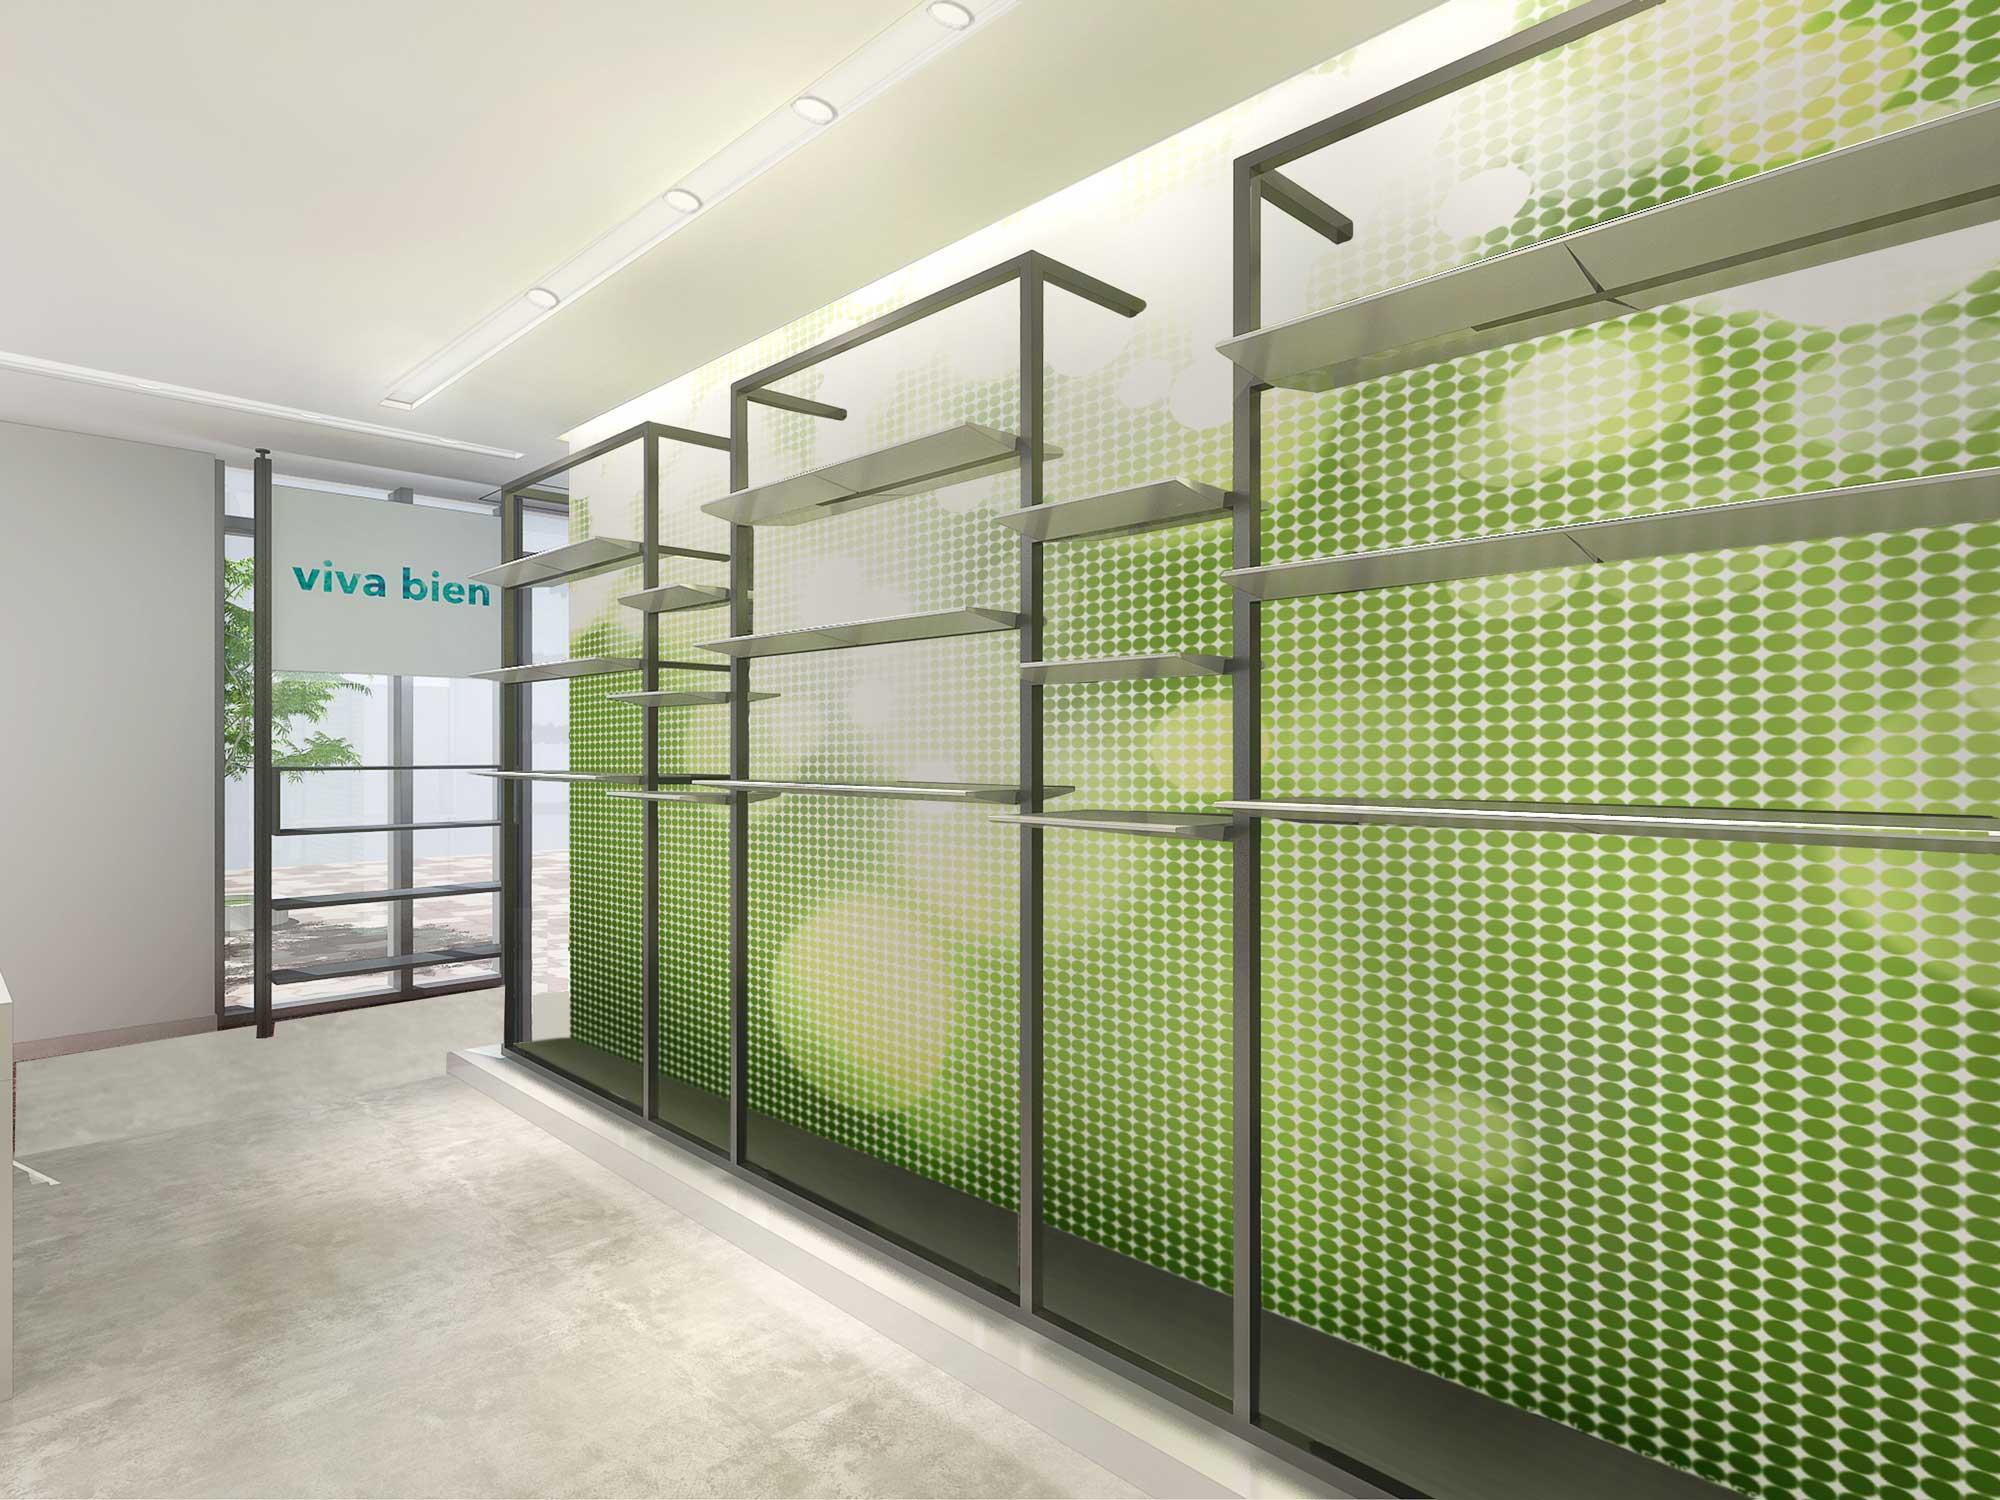 tsao-kp-healthy-living-retail-rend-01.jpg